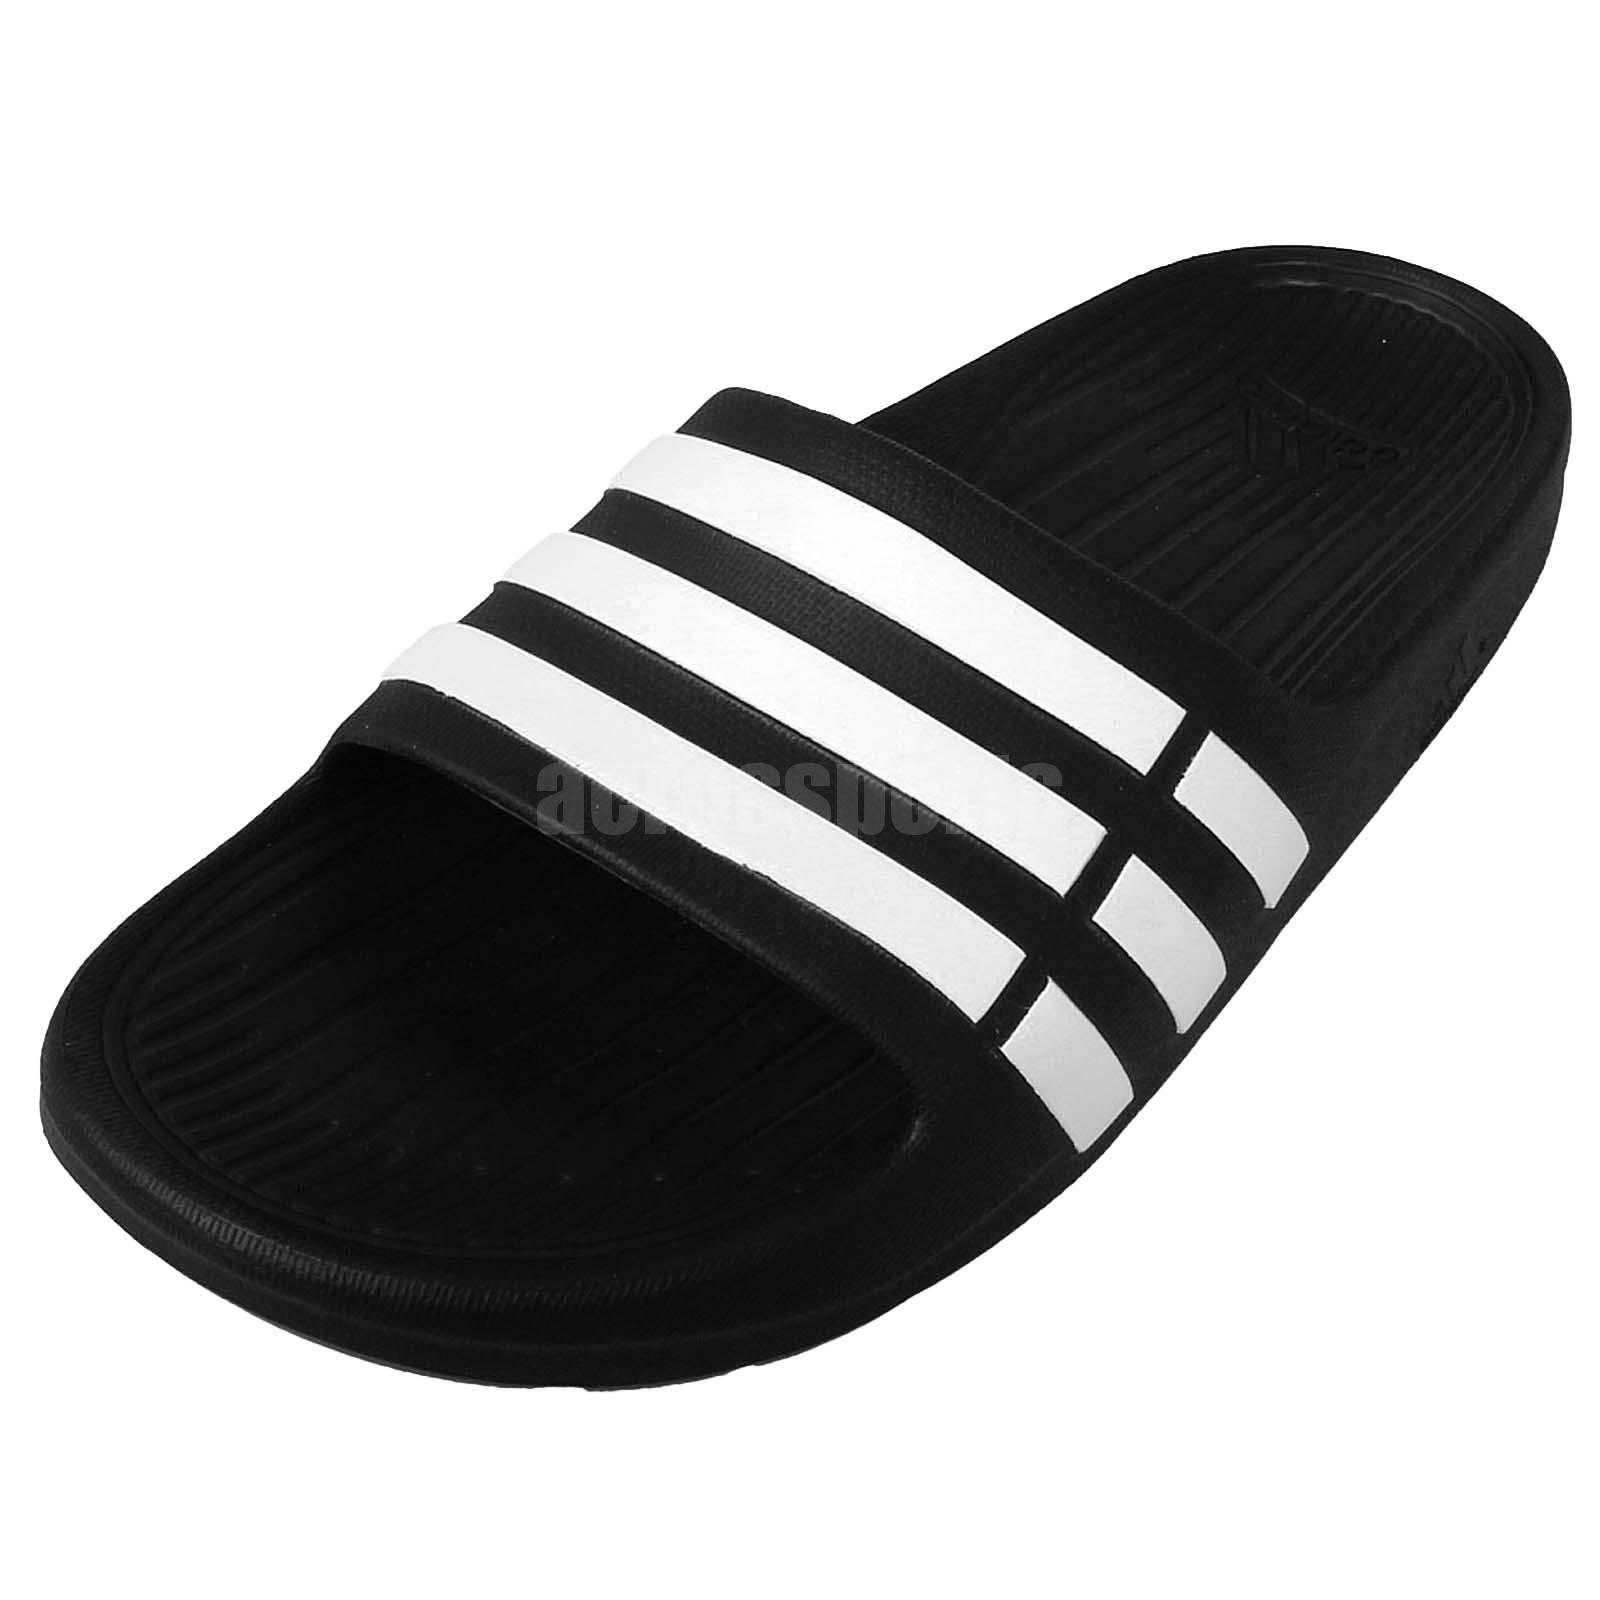 a4e09783cdfced adidas Duramo Slide K Black White Youth Girls Womens Slippers Sandals G06799